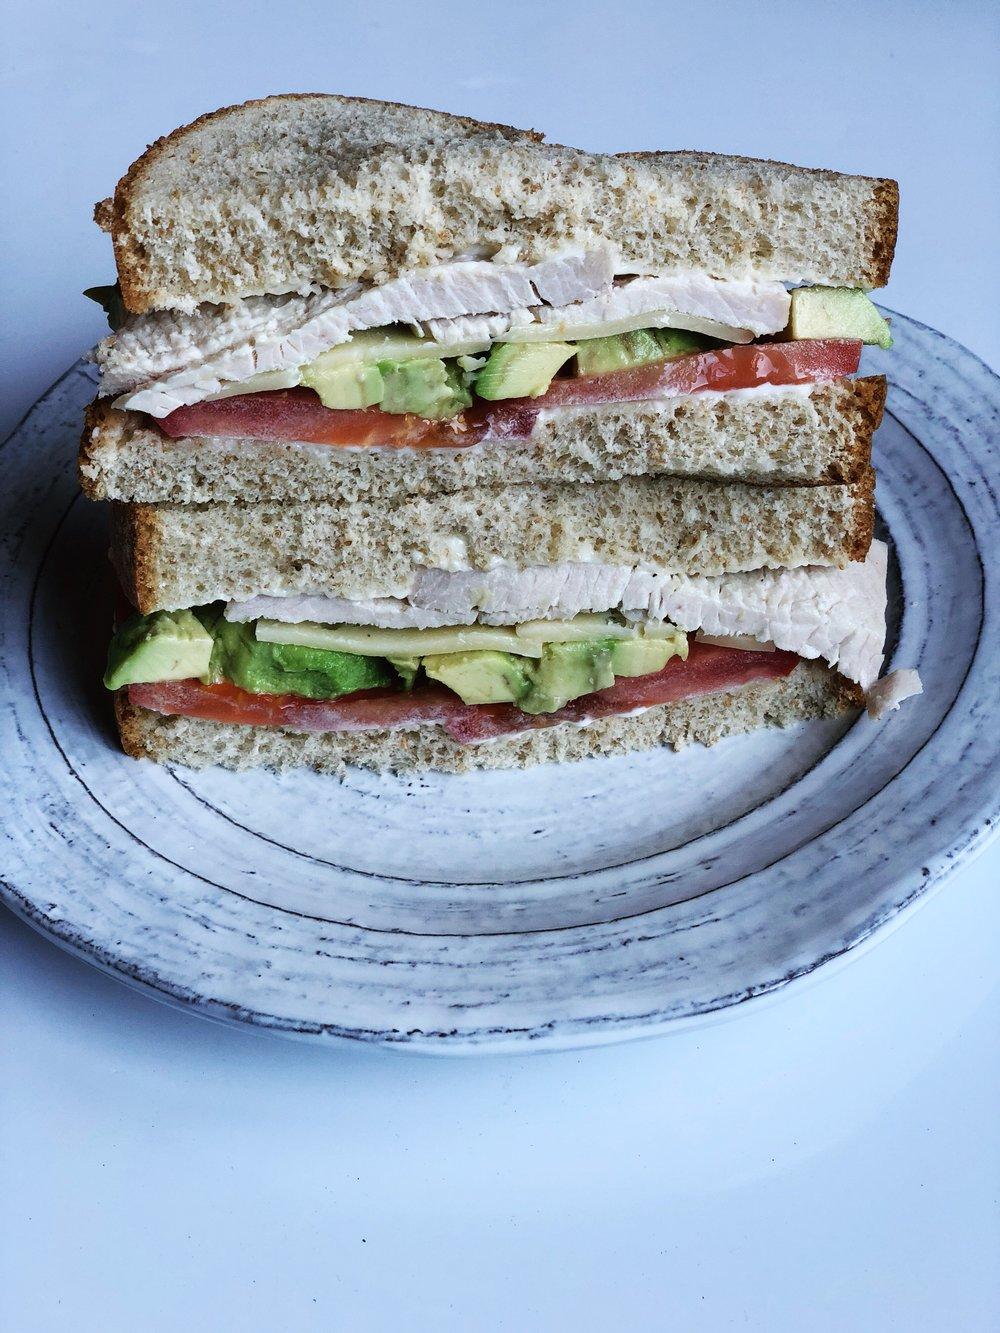 almonds and asana turkey sandwich cut.JPG